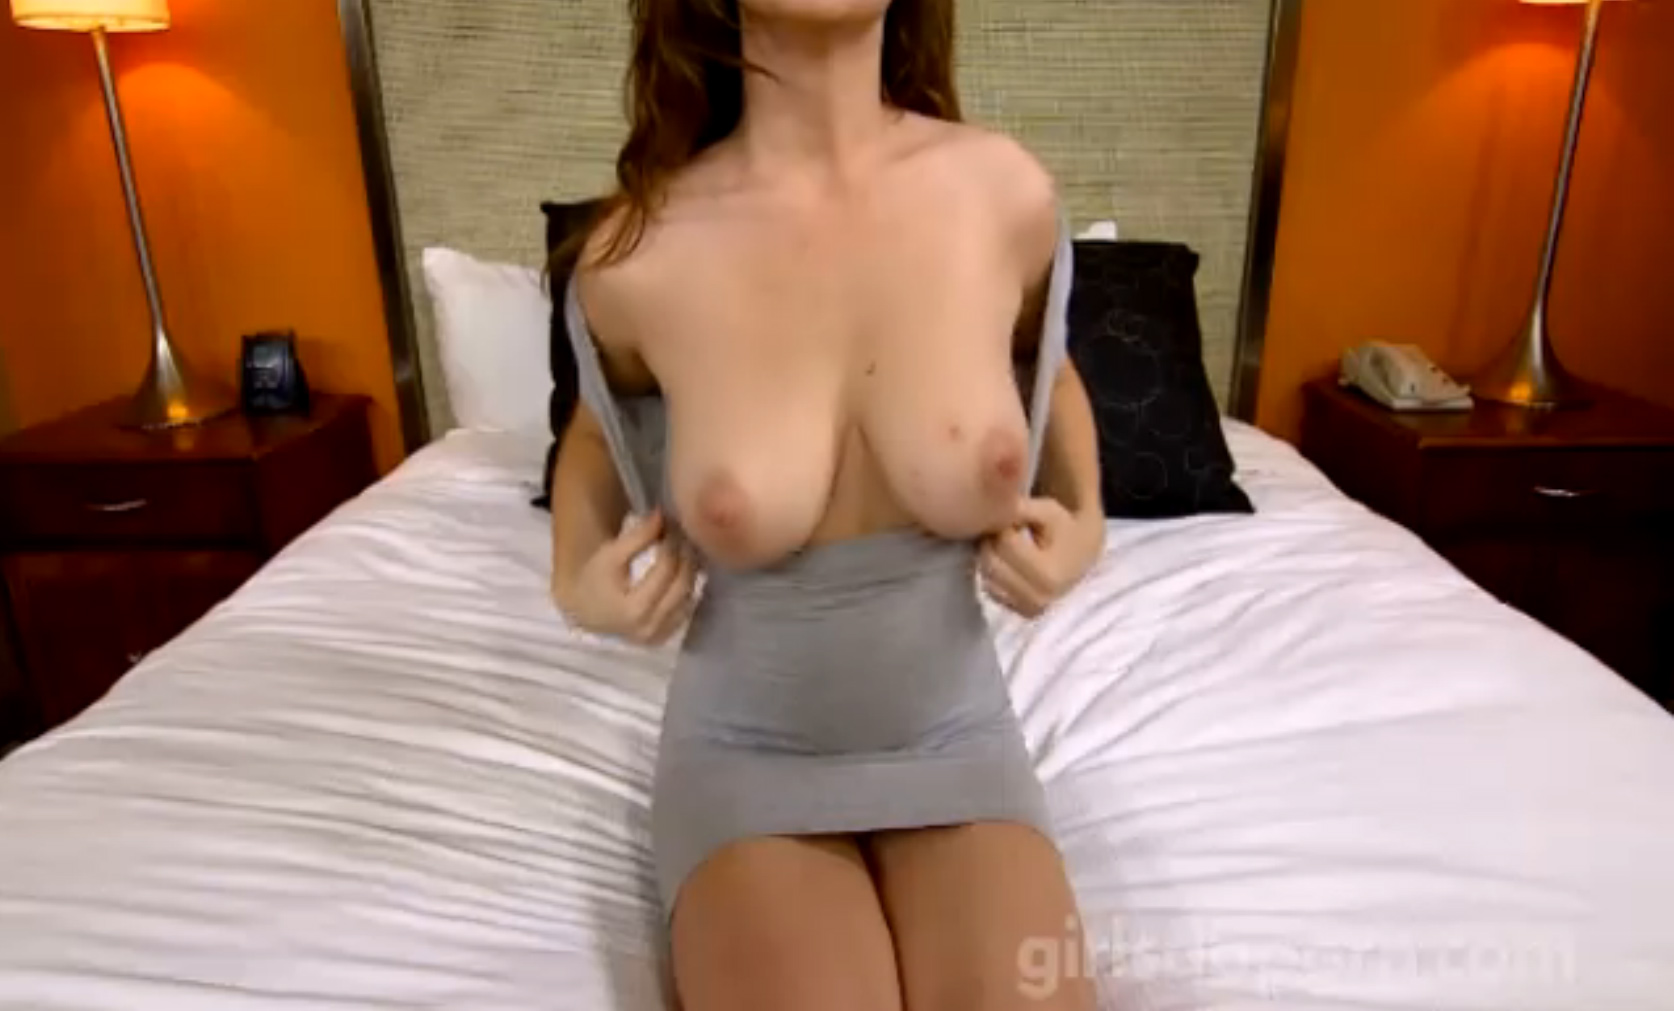 Hot Girls Doing Porn